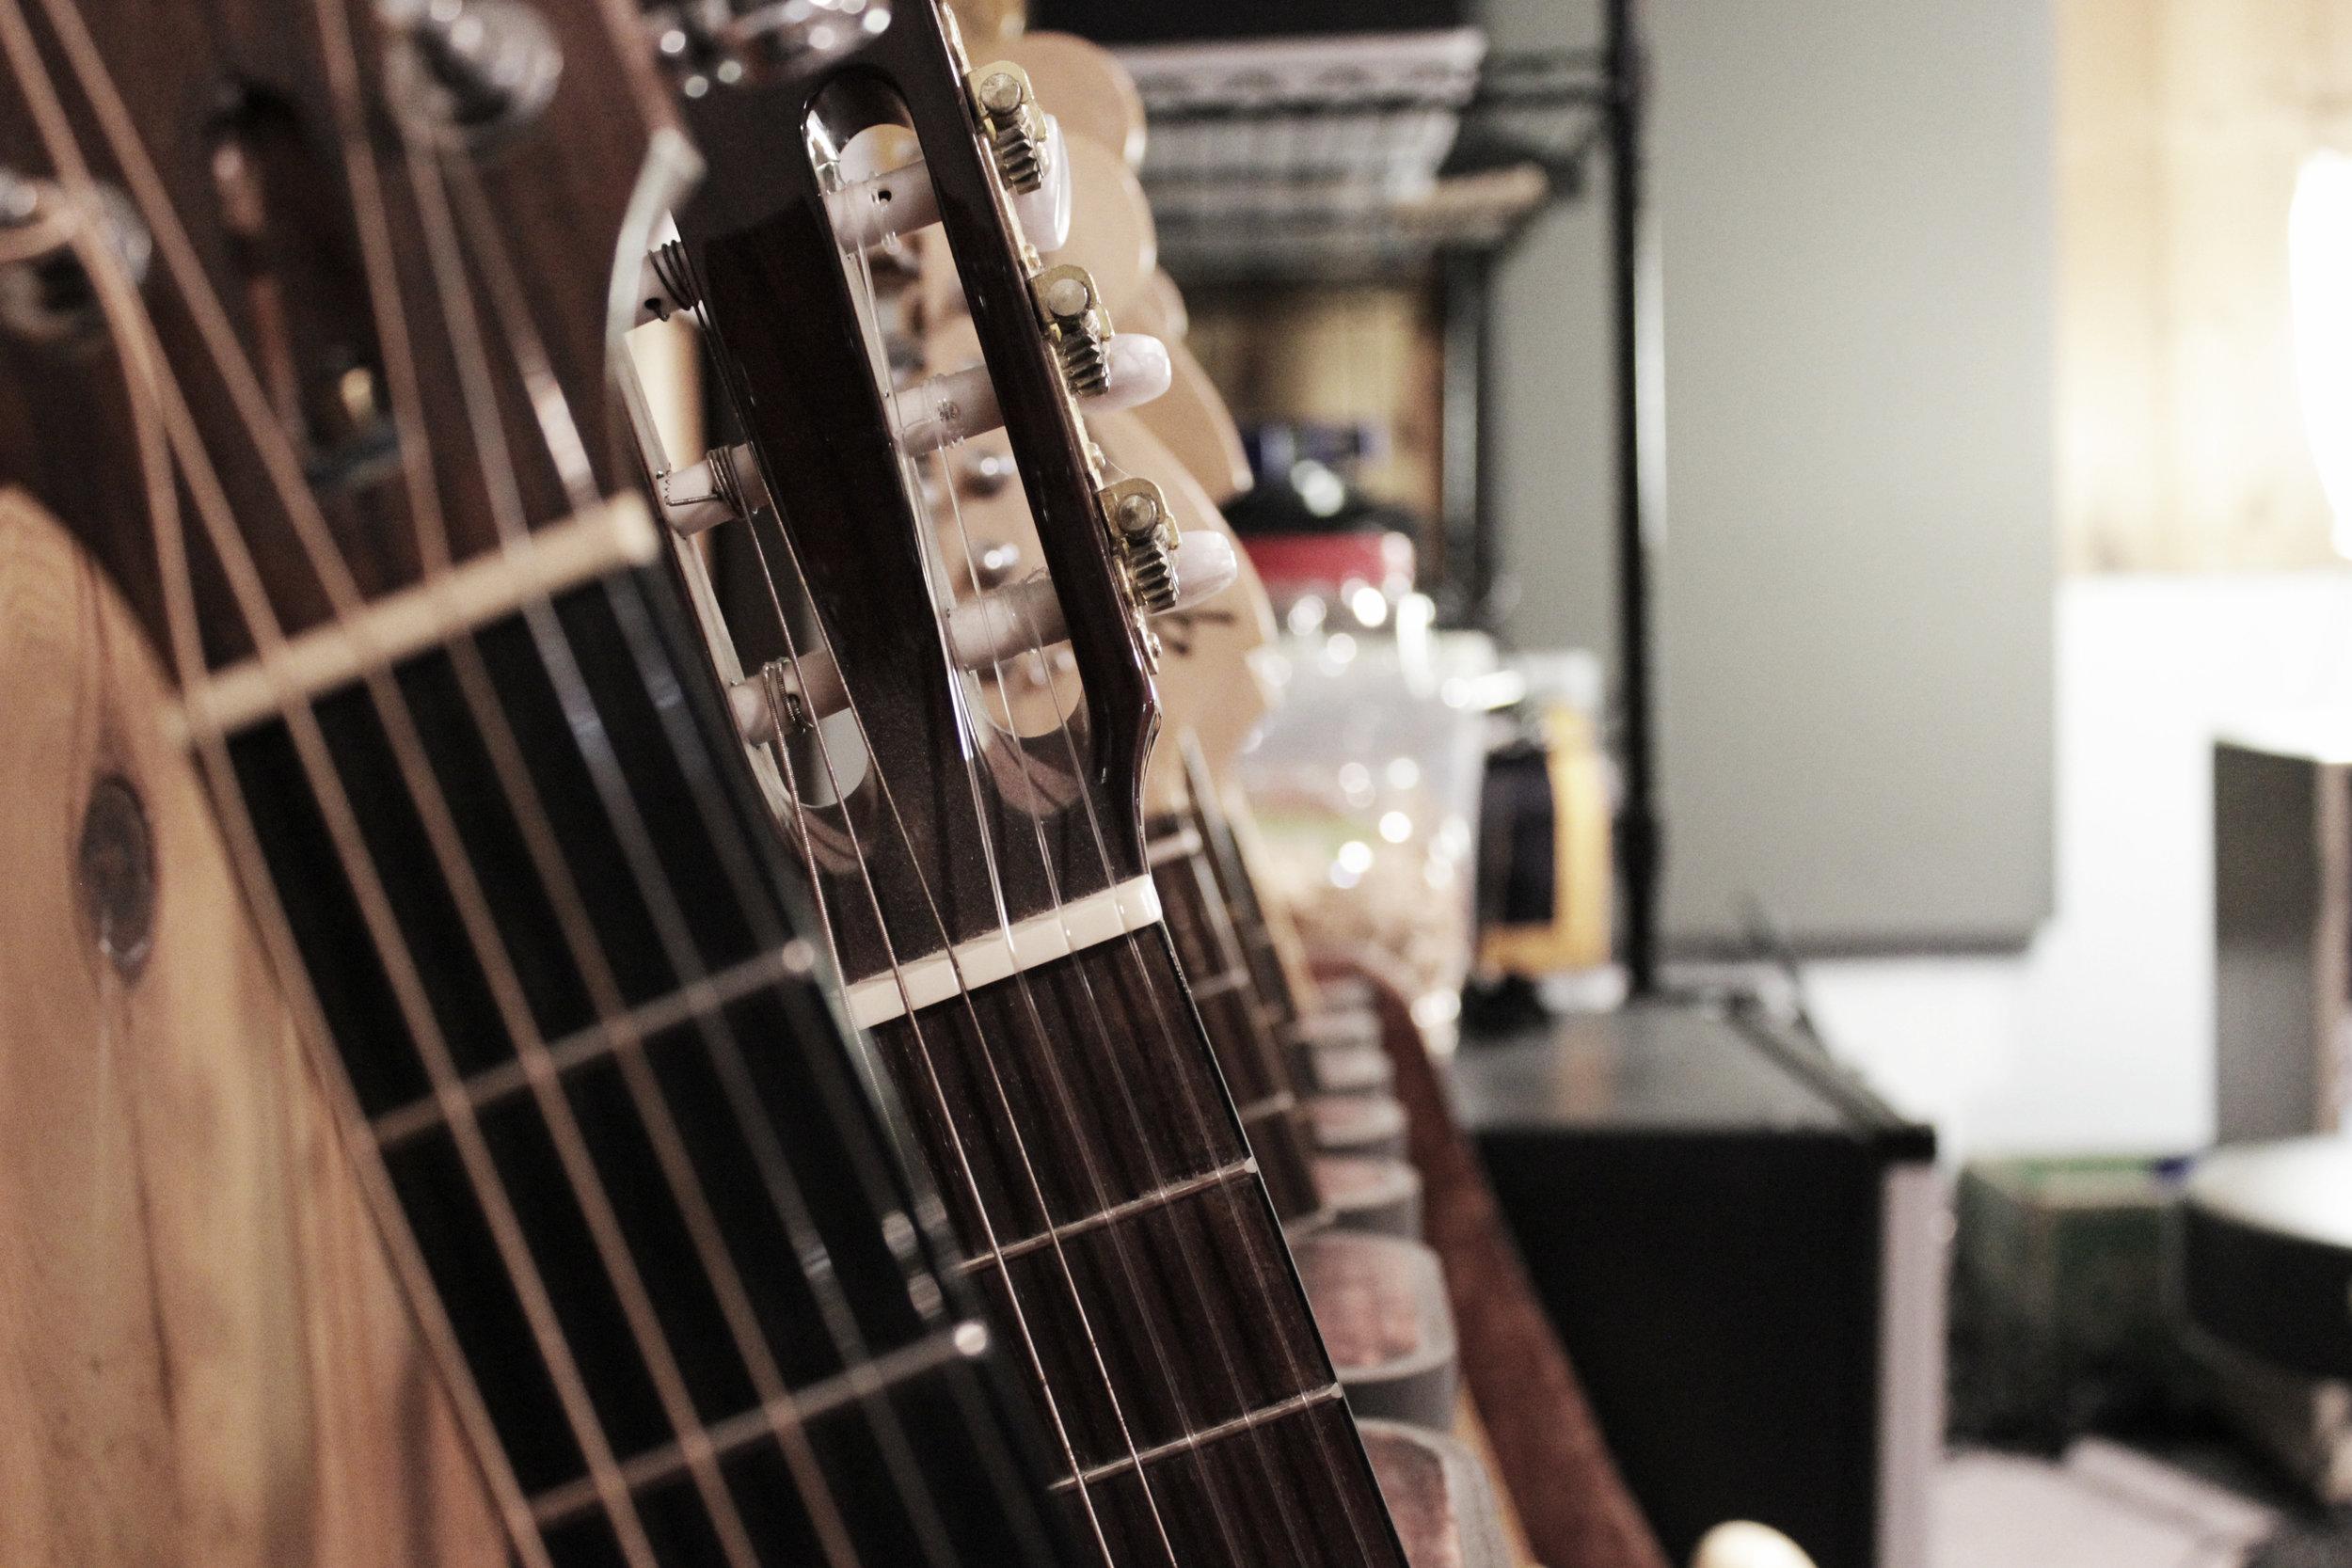 Guitars 001.jpg